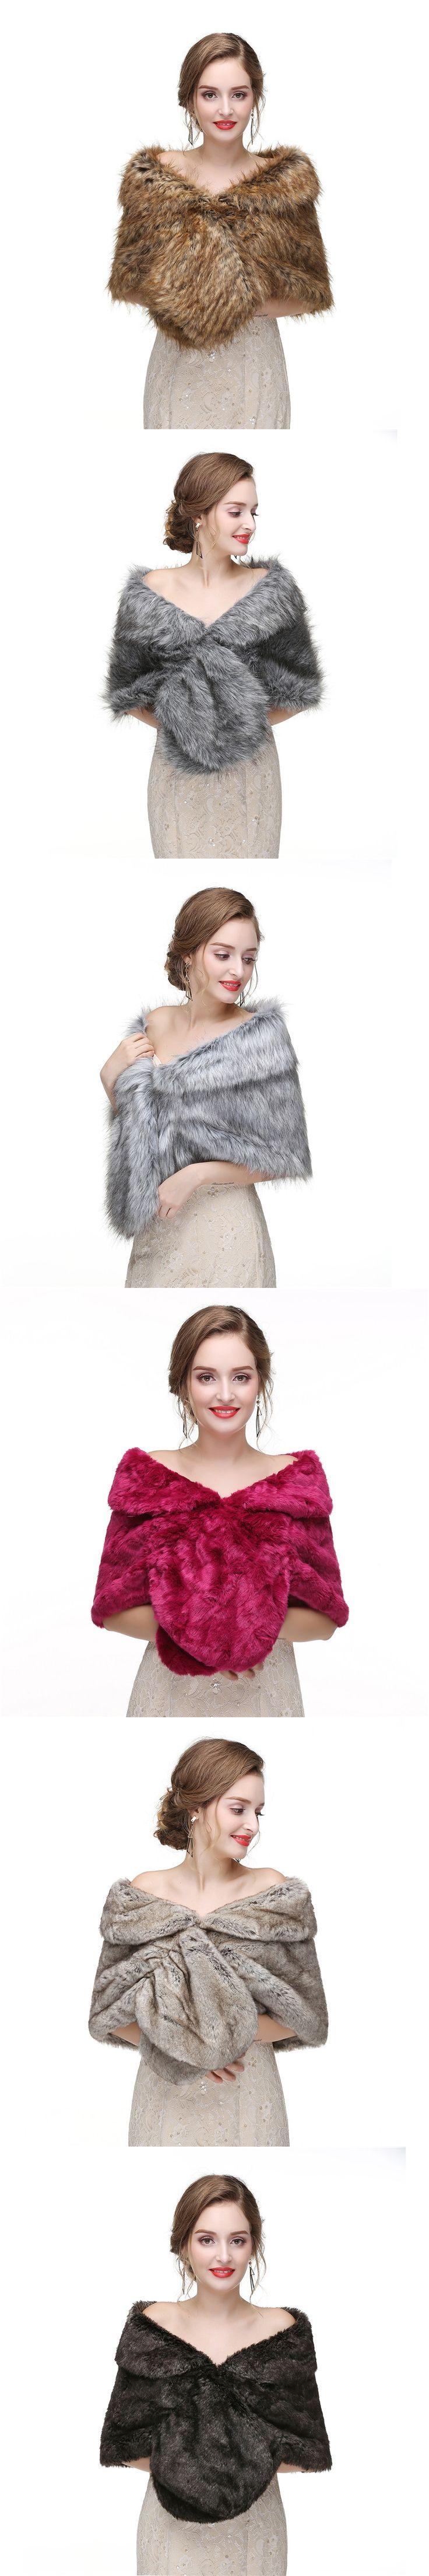 H&S BRIDAL Bolero Women Bridal Faux Fur For Wedding Evening Party Prom Jacket Coat Winter Fur Shawl Wedding Boleros